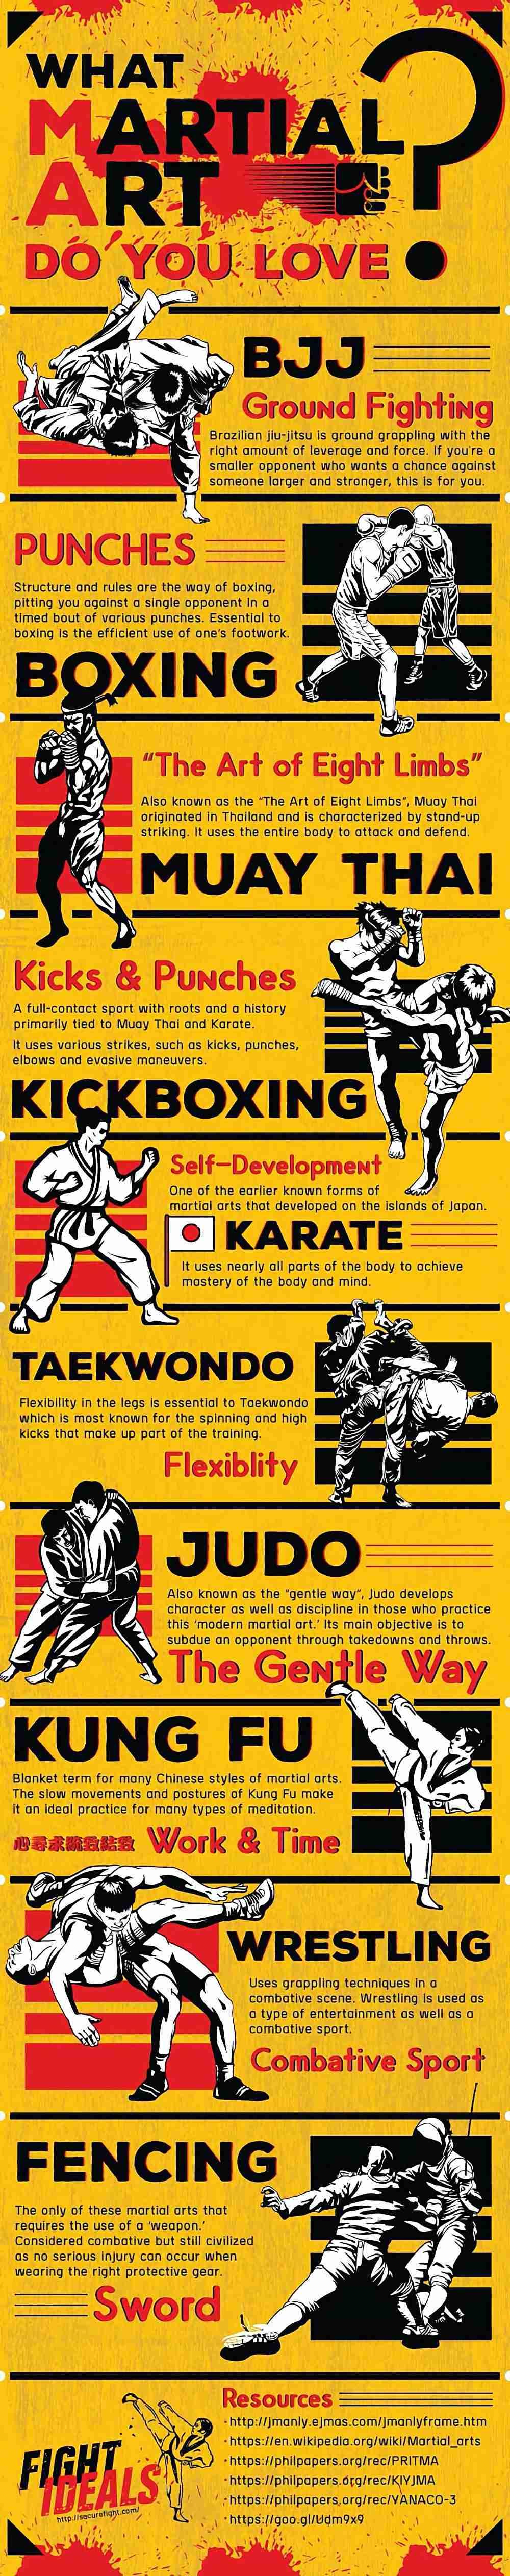 What martial art do you love?